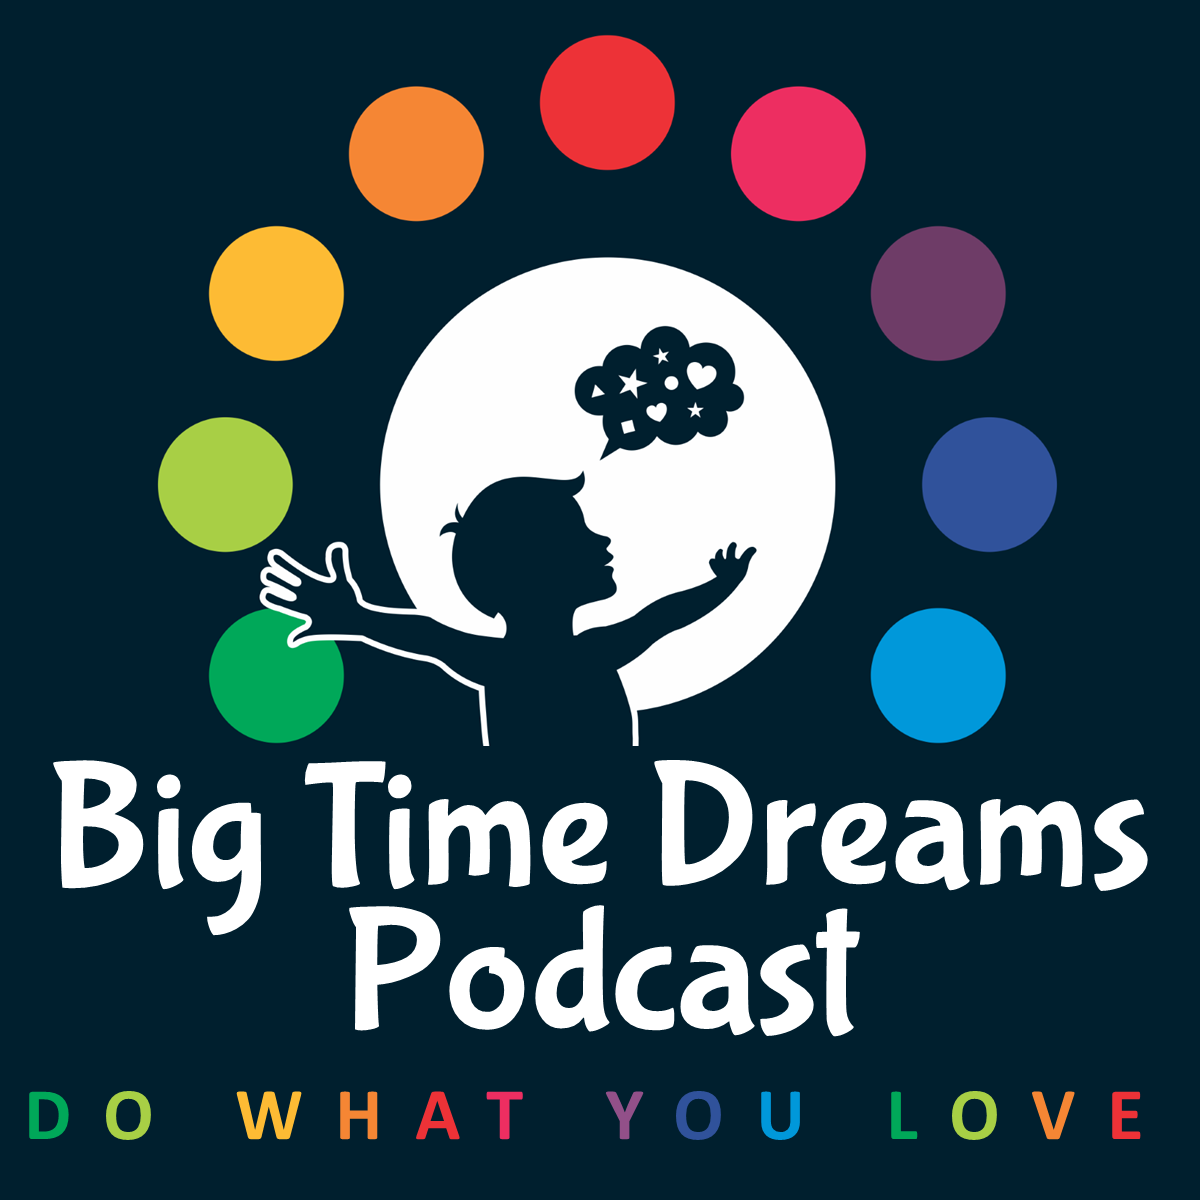 Big Time Dreams Podcast show art